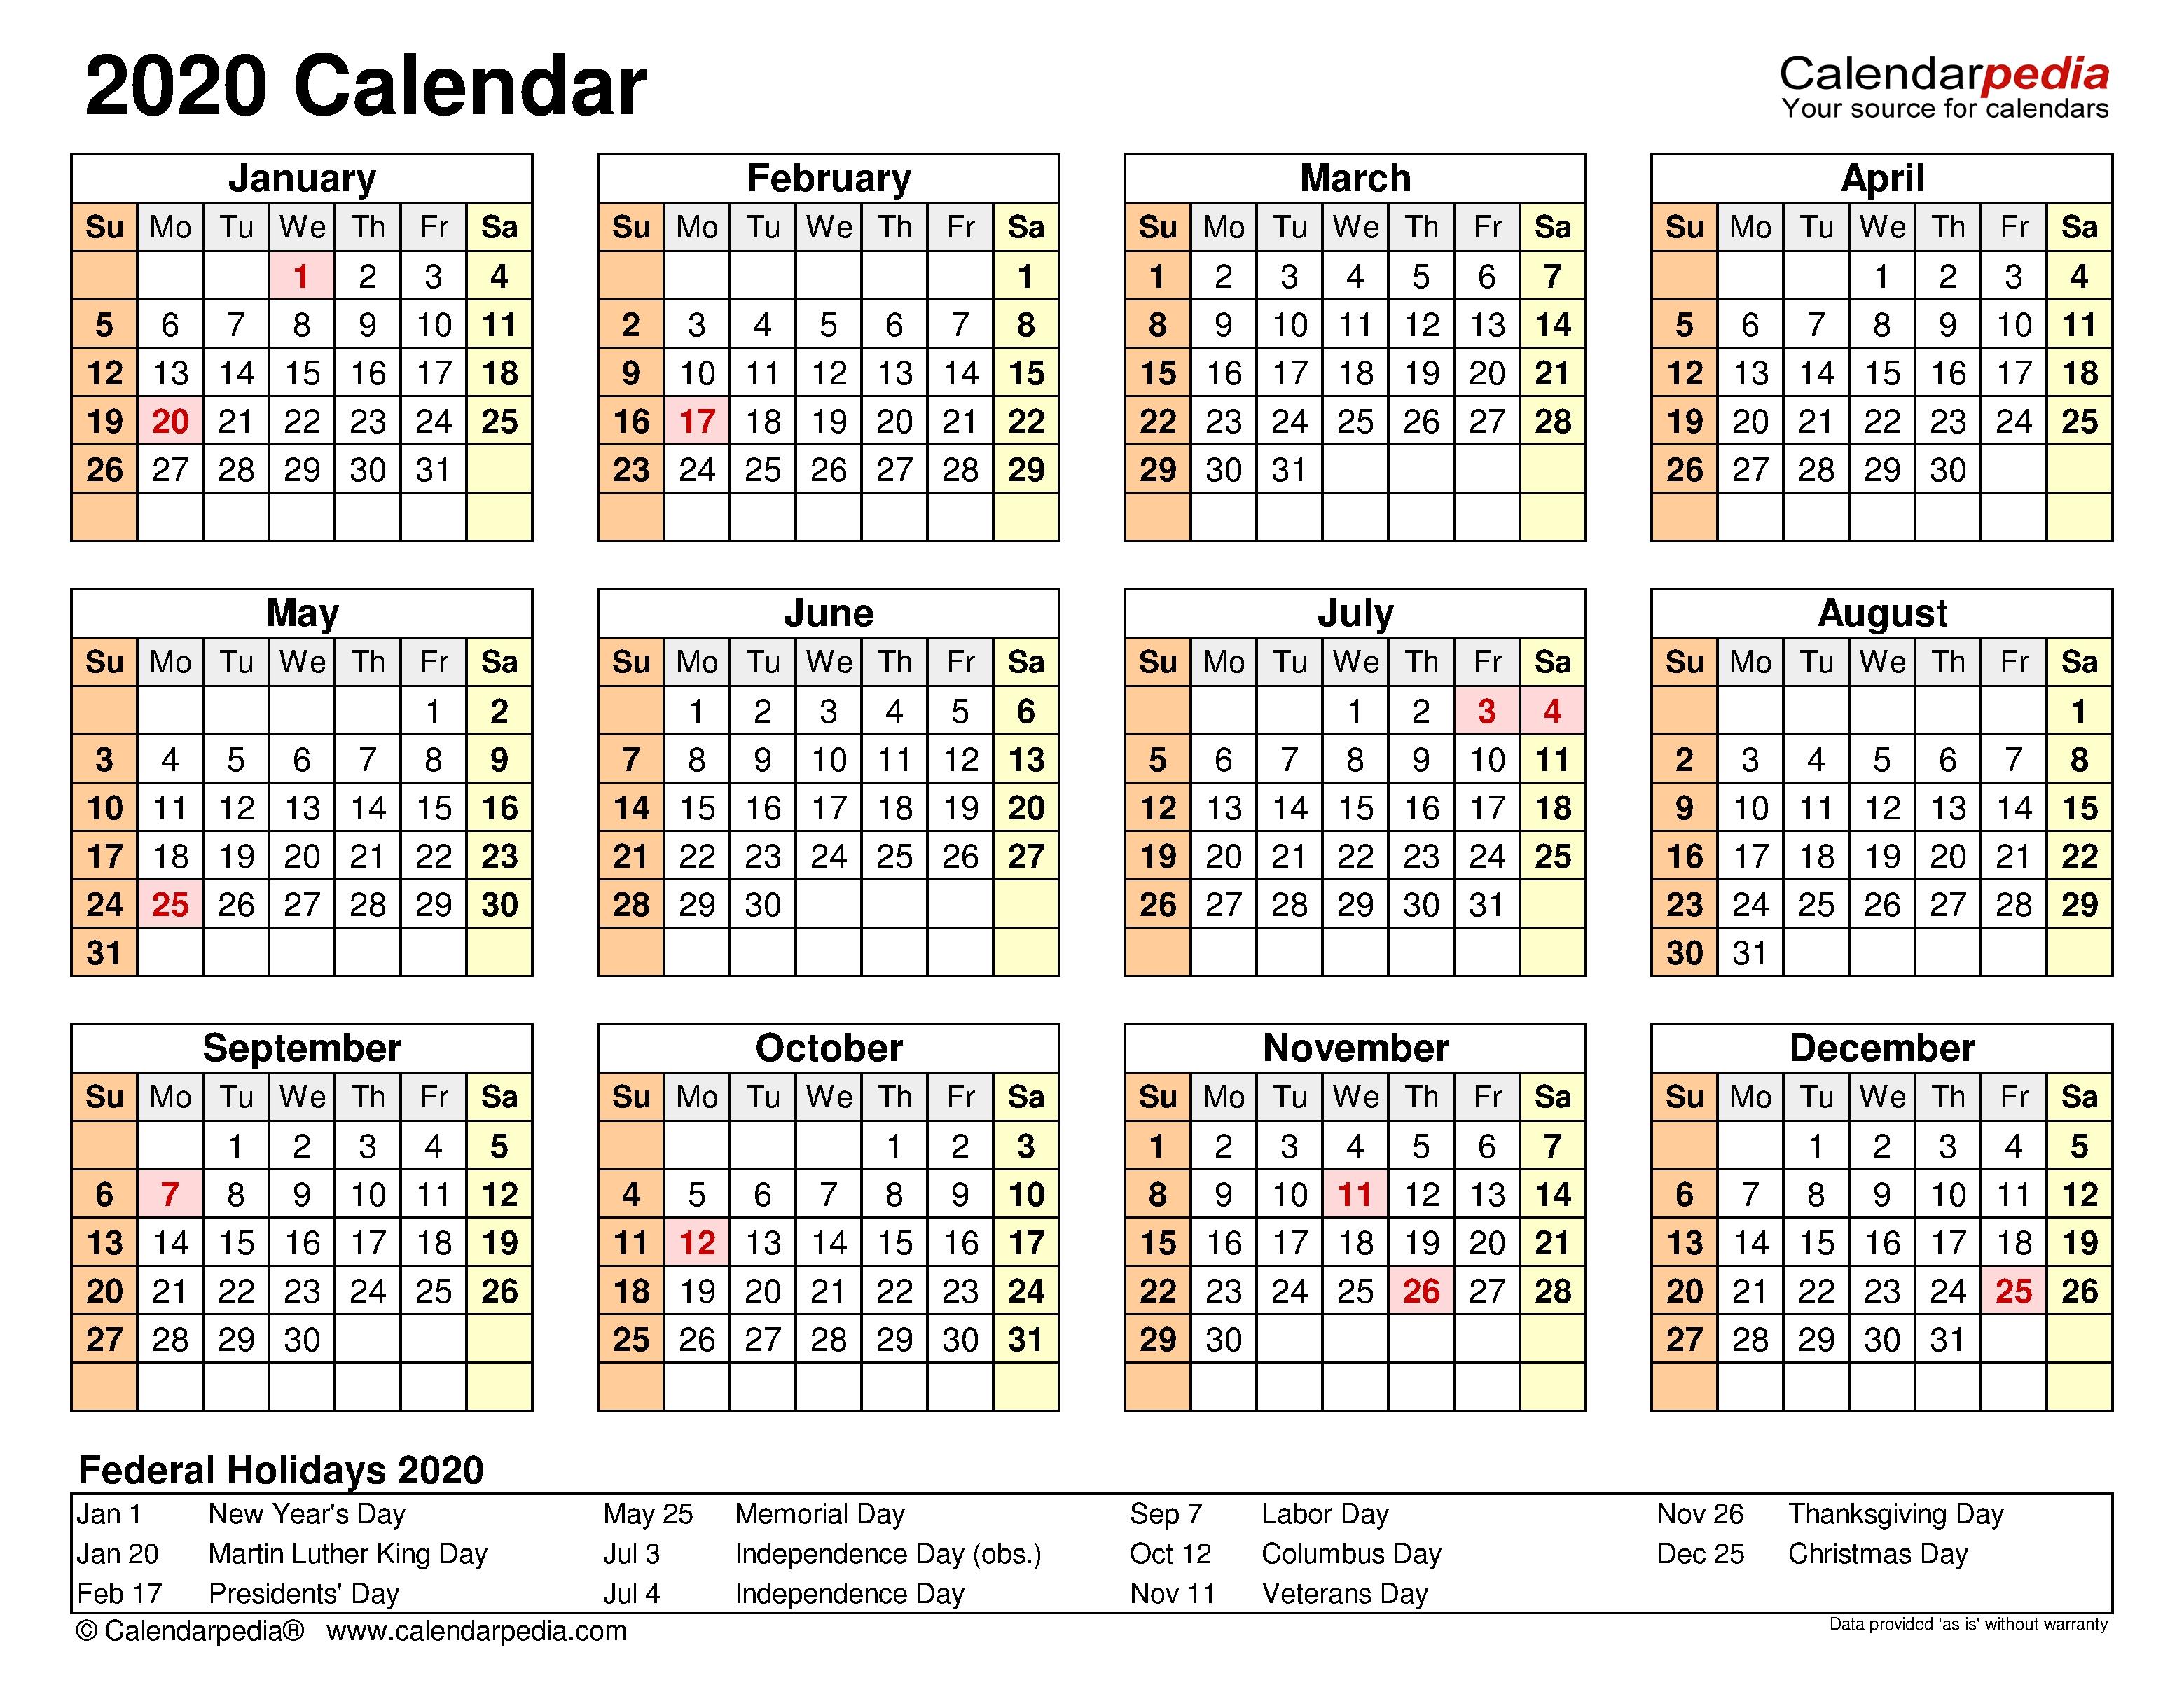 2020 Calendar - Free Printable Templates-School Year Calendar 2020-20 Template